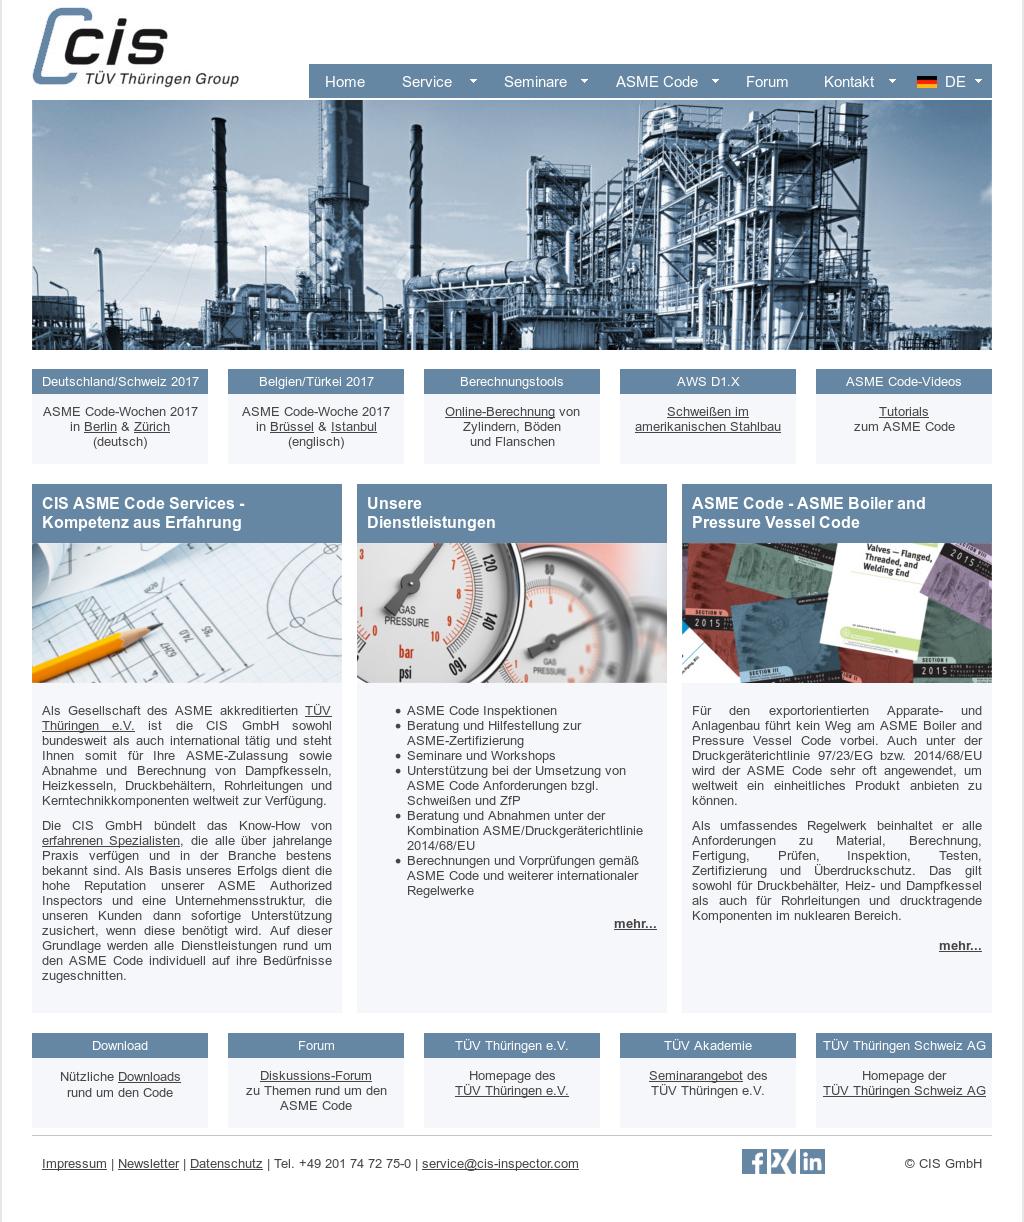 Wunderbar Dampfkessel Definition Ideen - Schaltplan Serie Circuit ...